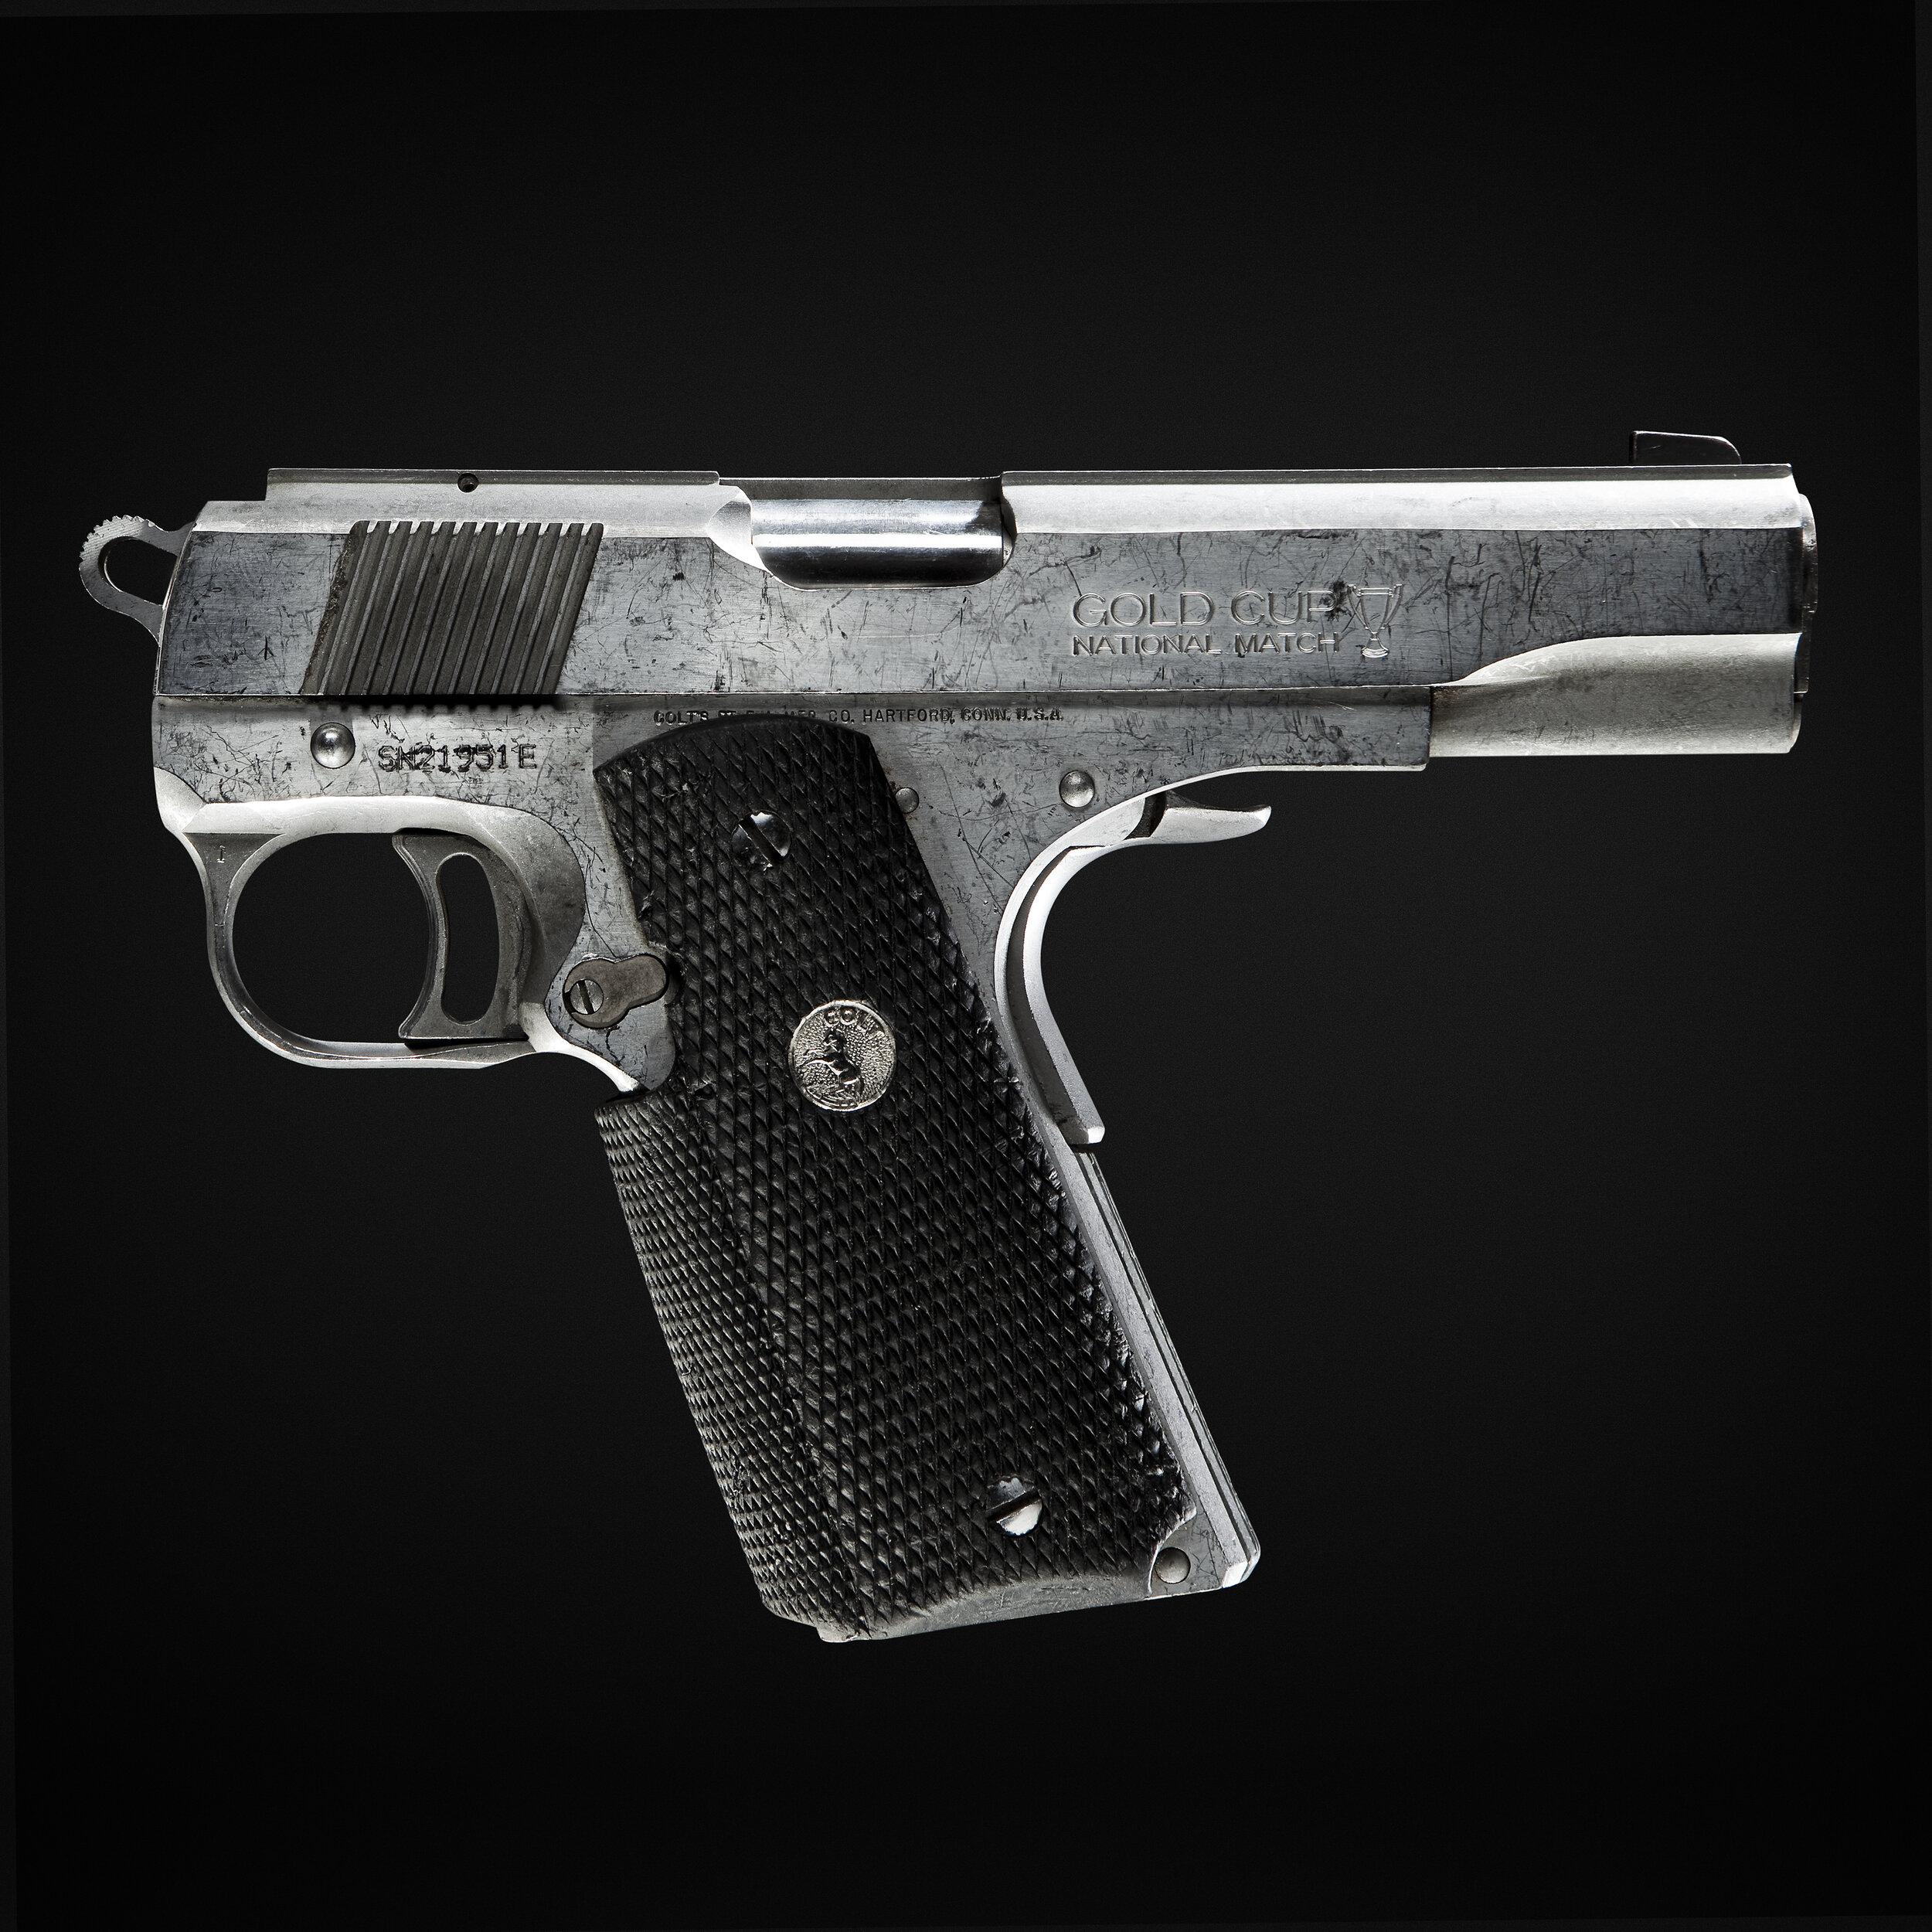 RW_Guns_3204_master.jpg